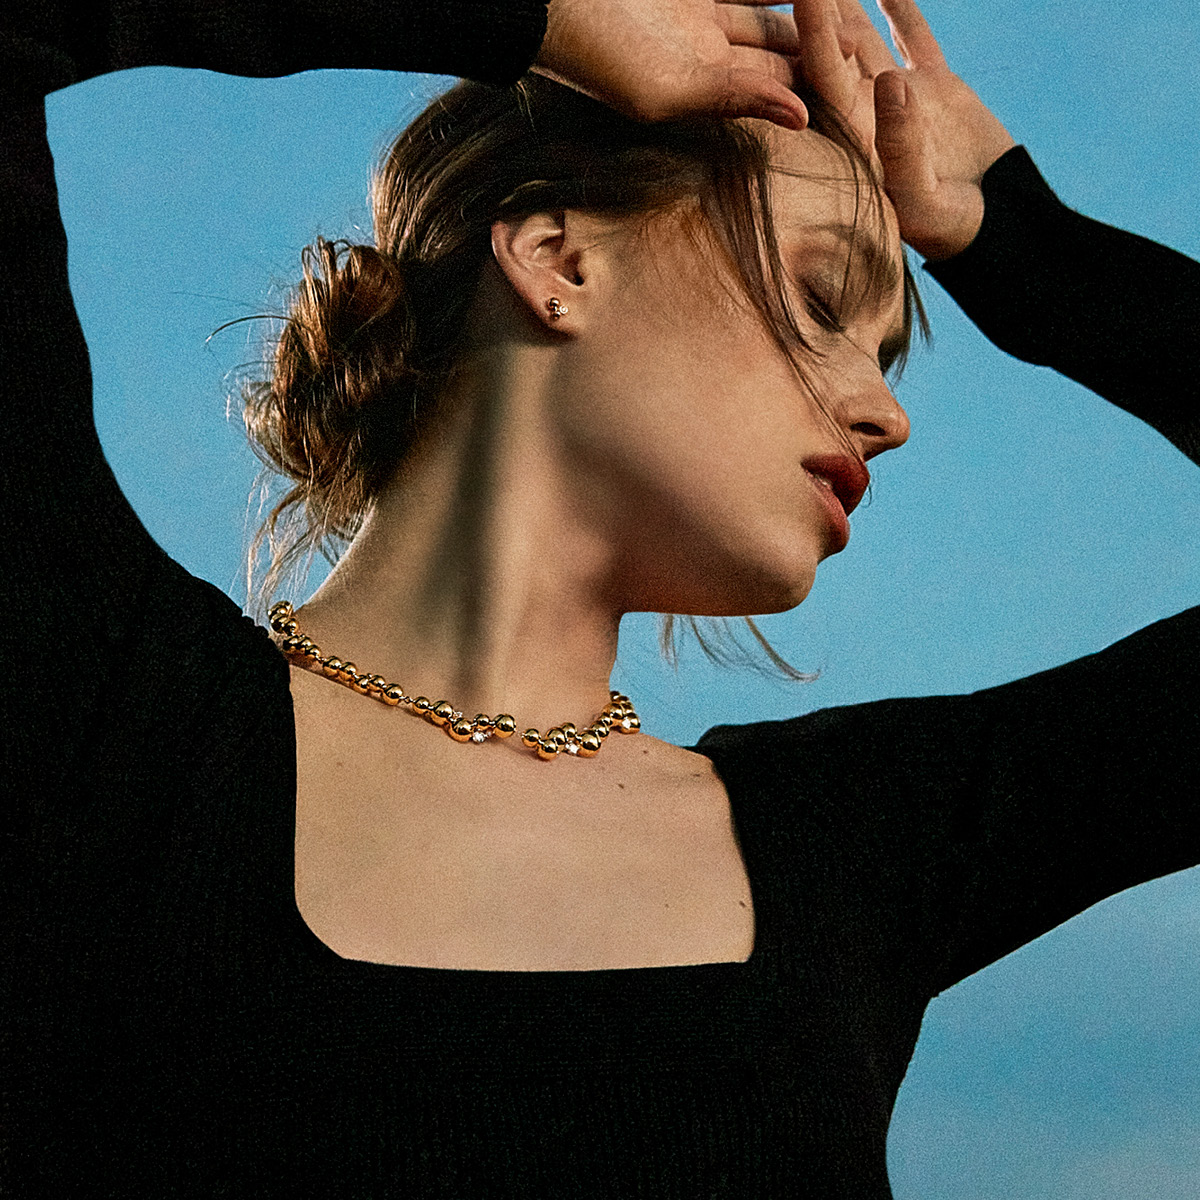 MOONLIGHT GRAPES Bracelet